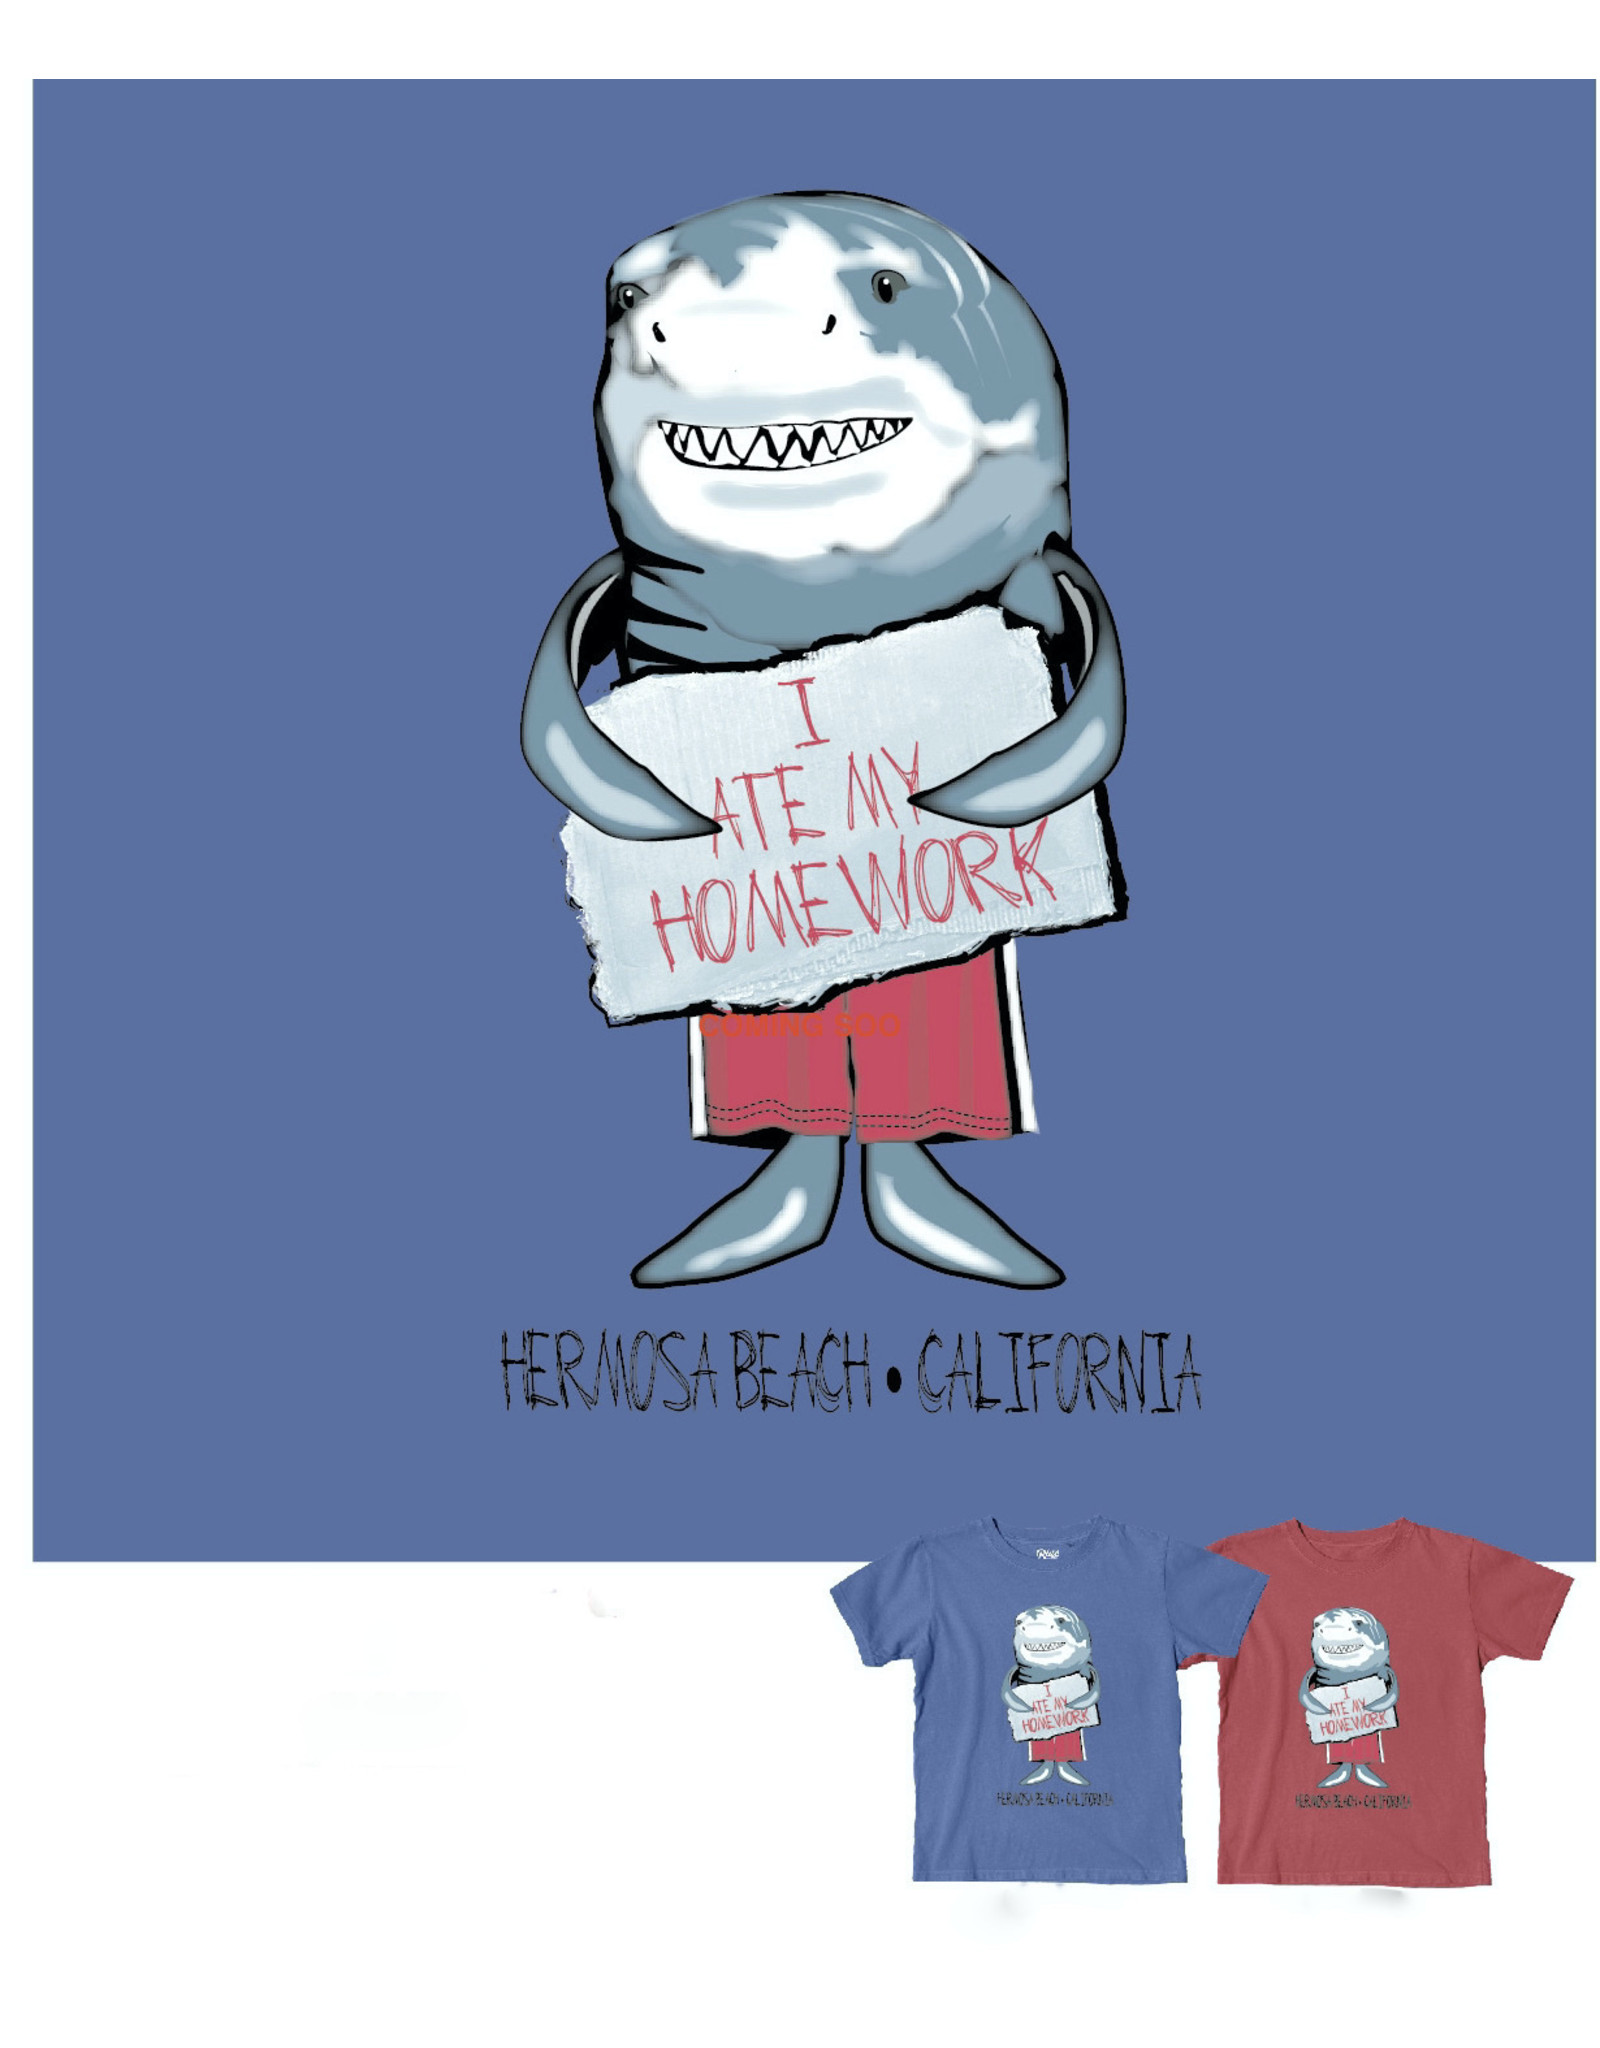 Blue 84 #50Y B84 DR YOUTH SS HB SMALL SPRITE SHARK TAHITI BLUE